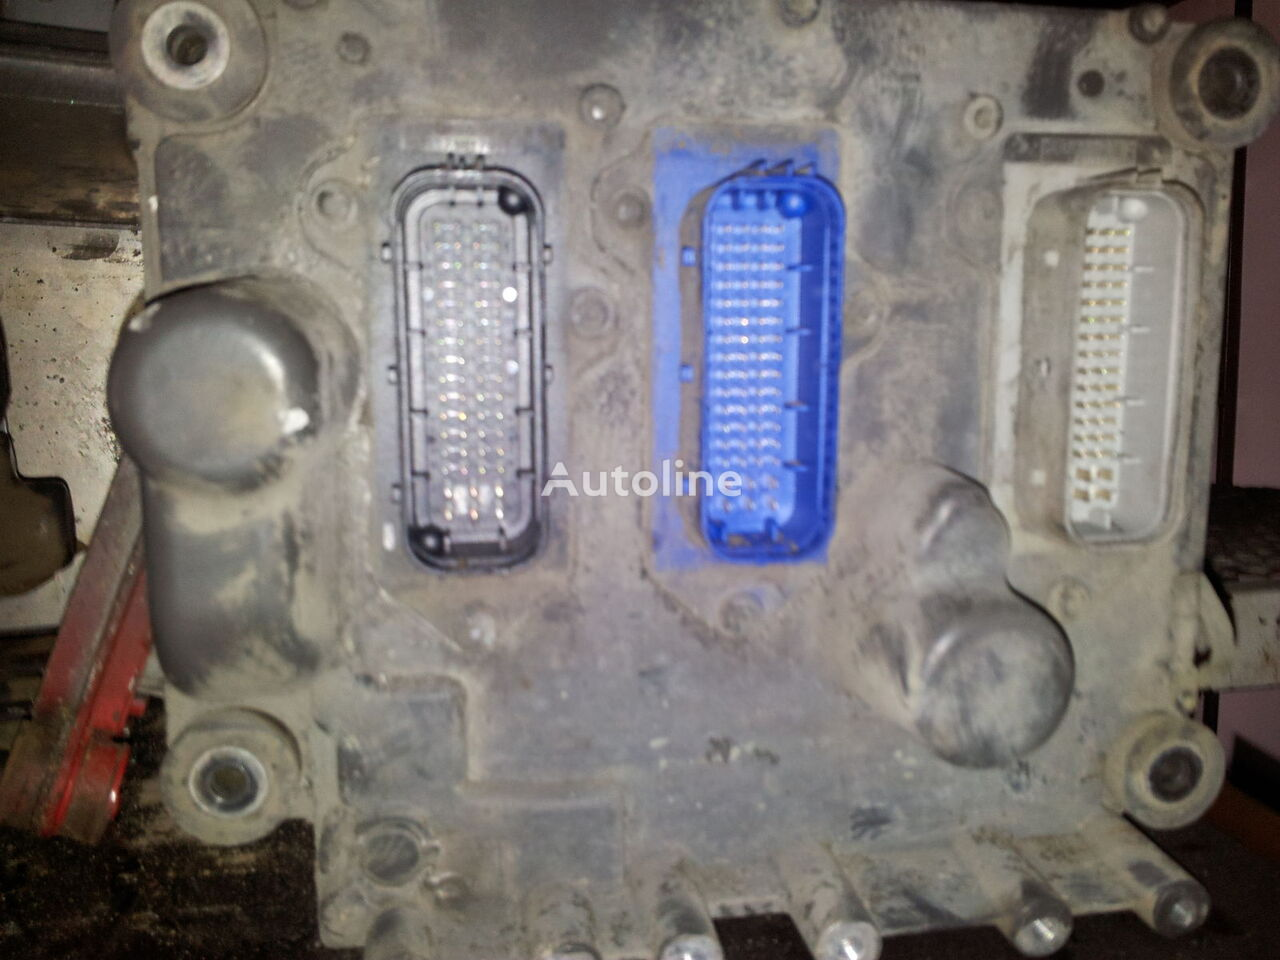 DAF 105XF EURO5 electronic control unit ECU EDC engine managment, engine control unit, DMCI 1679021; 1684367, 1664539, 1679021, 1684367, 1887331 Steuereinheit für DAF 105XF Sattelzugmaschine